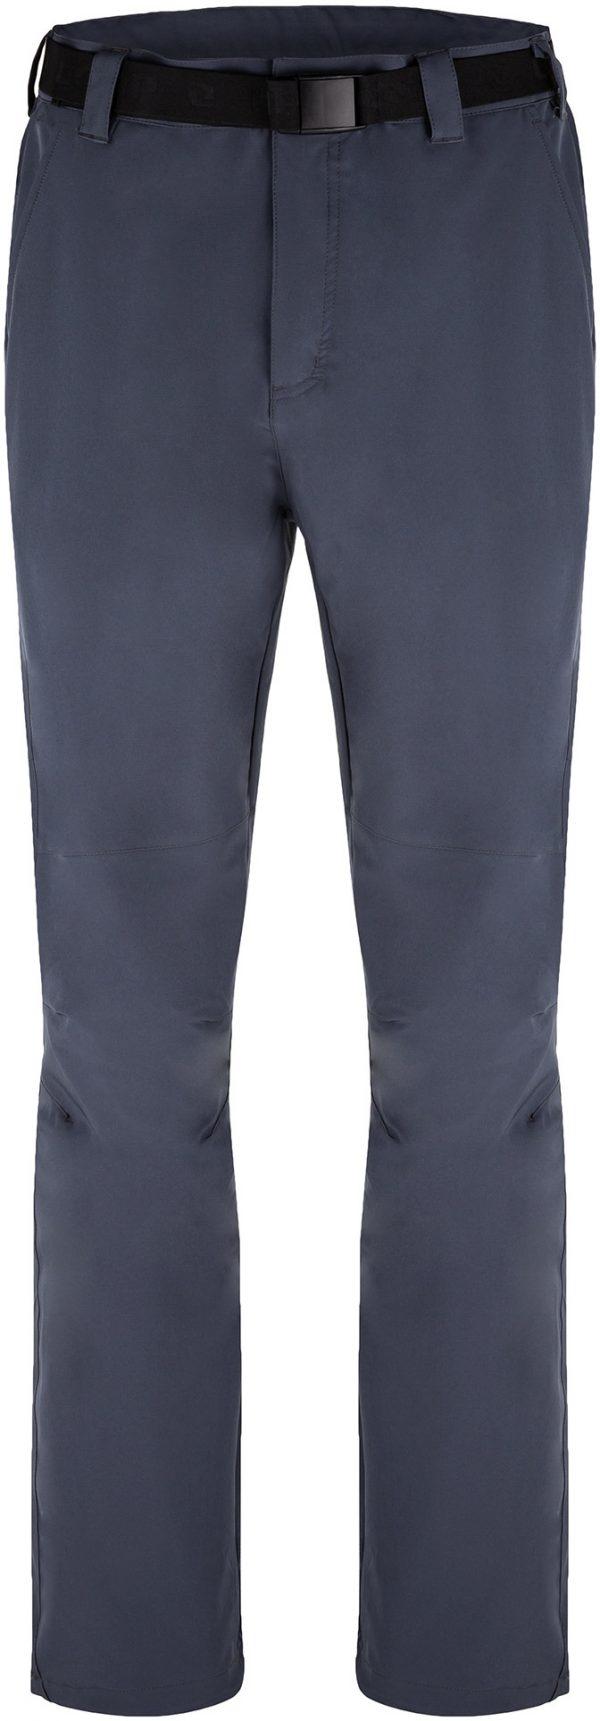 Pánské softshellové kalhoty Loap Uricke, K Sporting